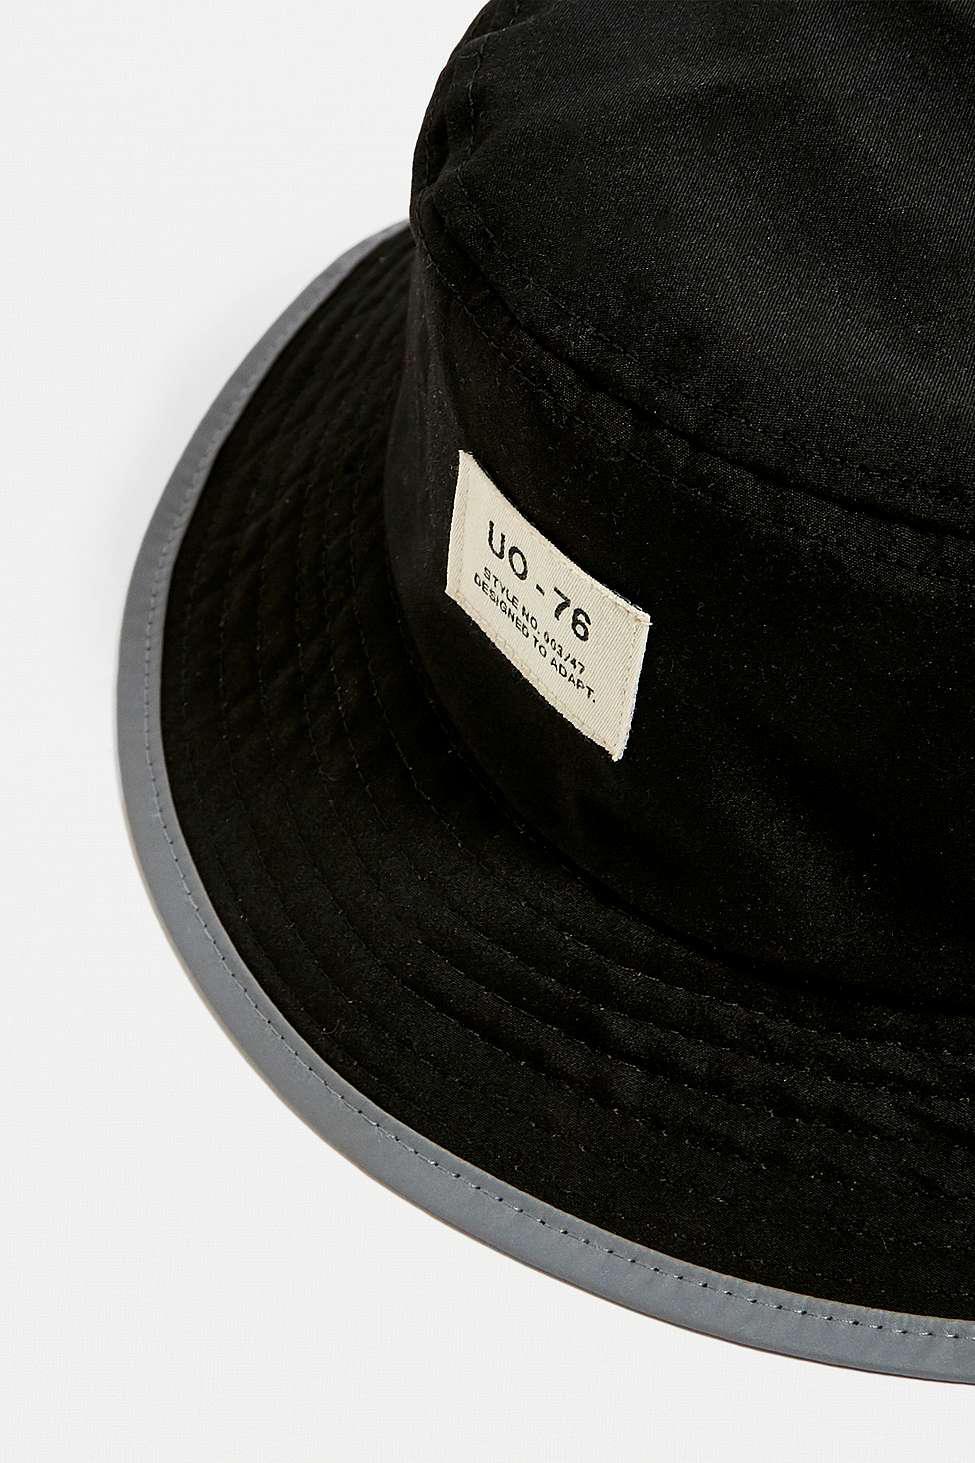 bfa56b57918 Urban Outfitters - Black Uo Fisherman Bucket Hat - Womens All - Lyst. View  fullscreen